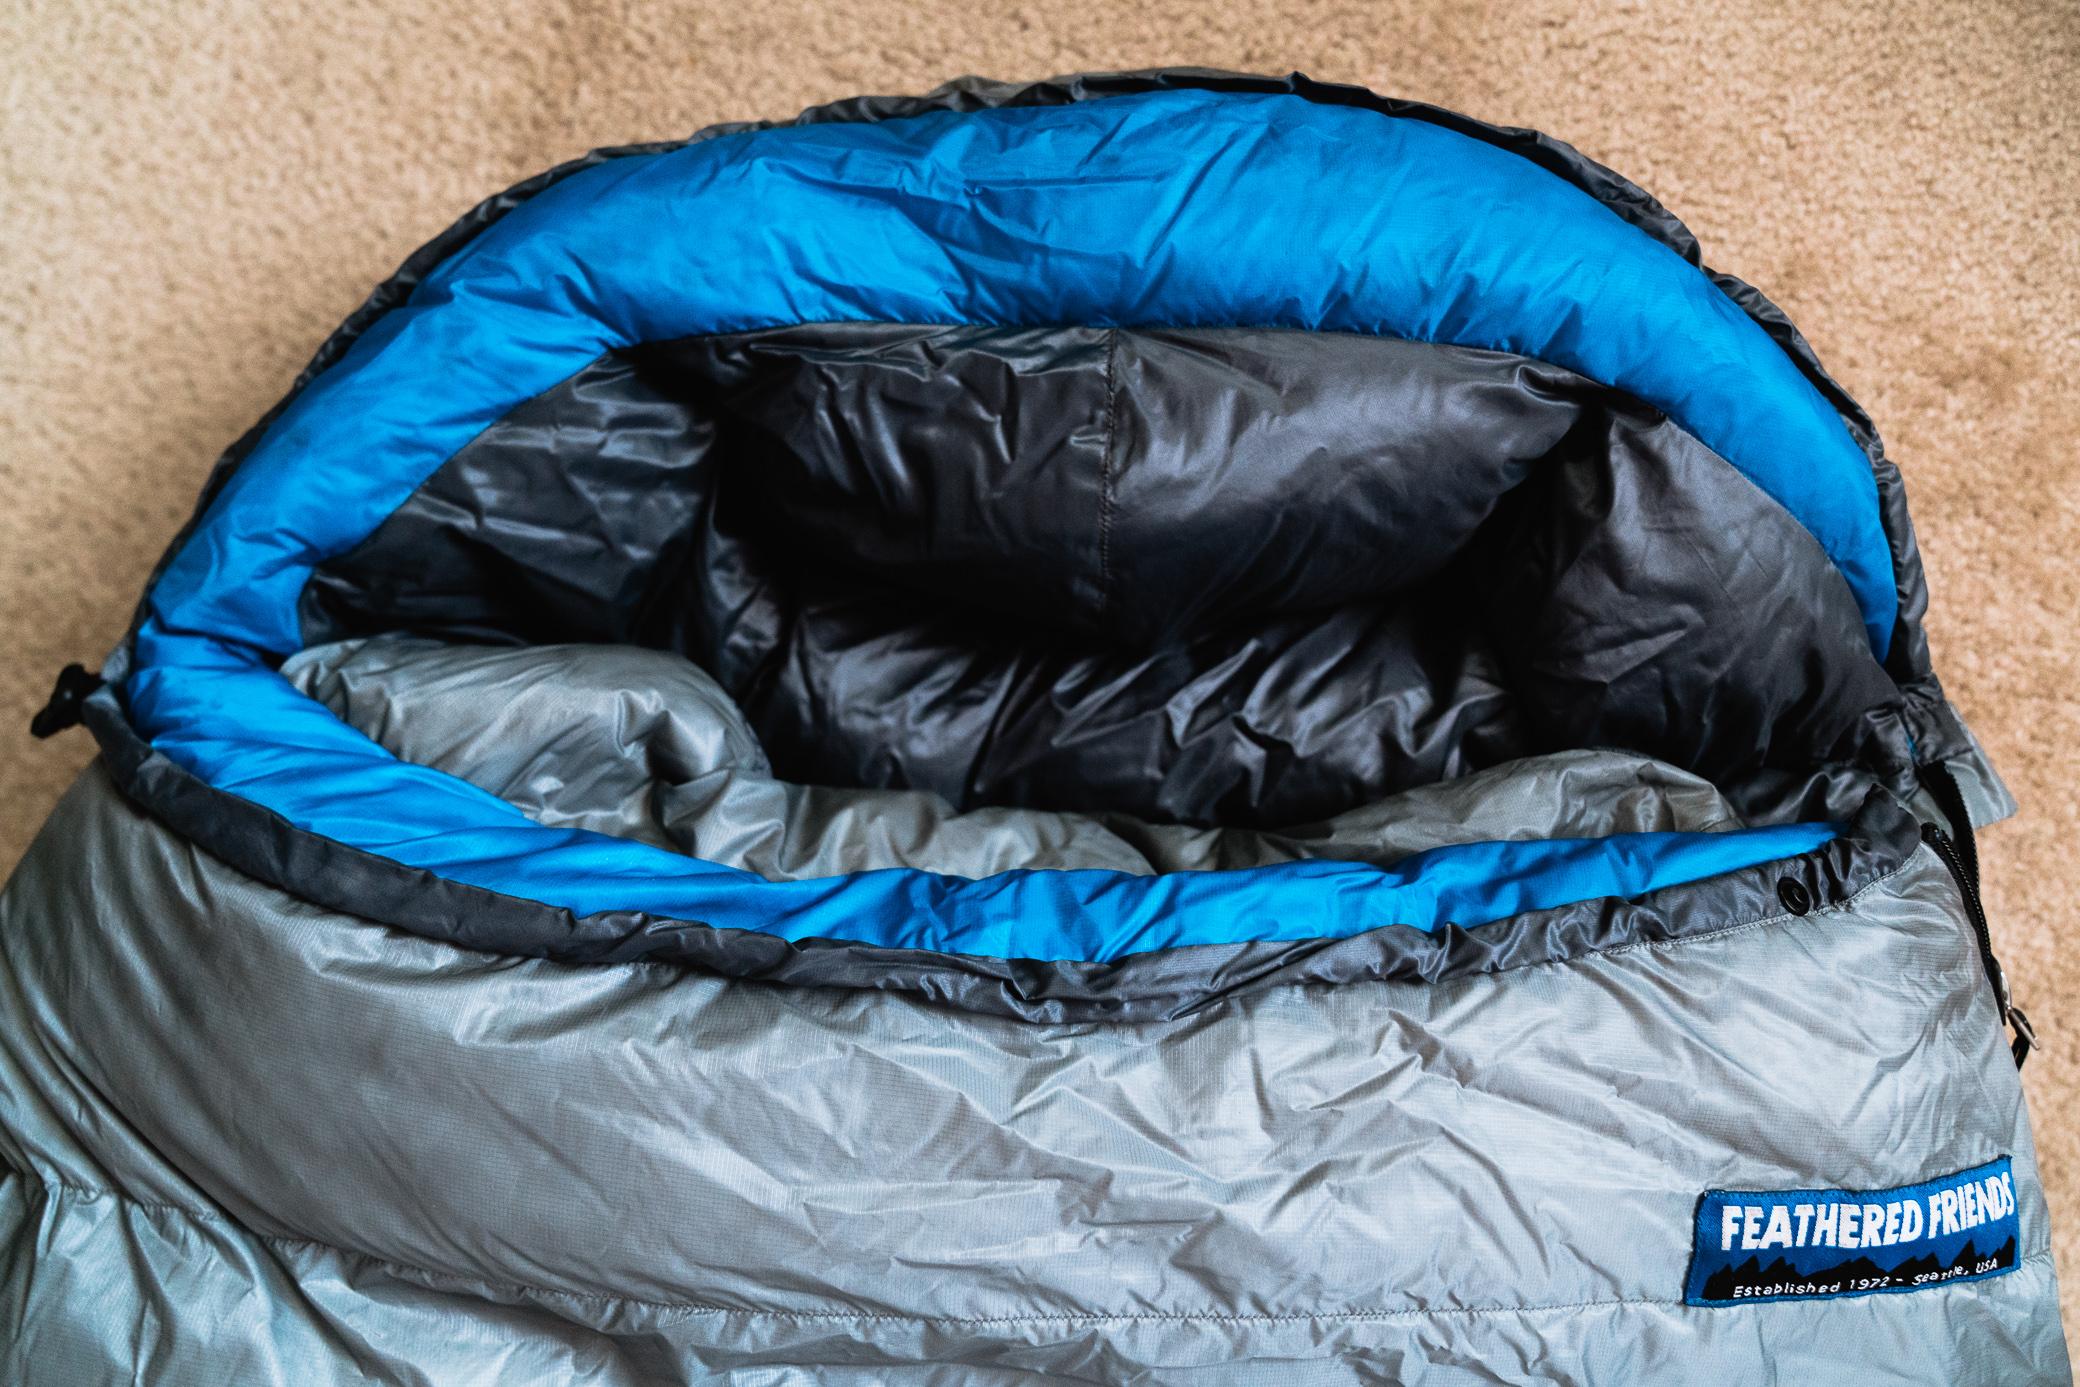 Feathered Friends Lark 10 UL Sleeping Bag